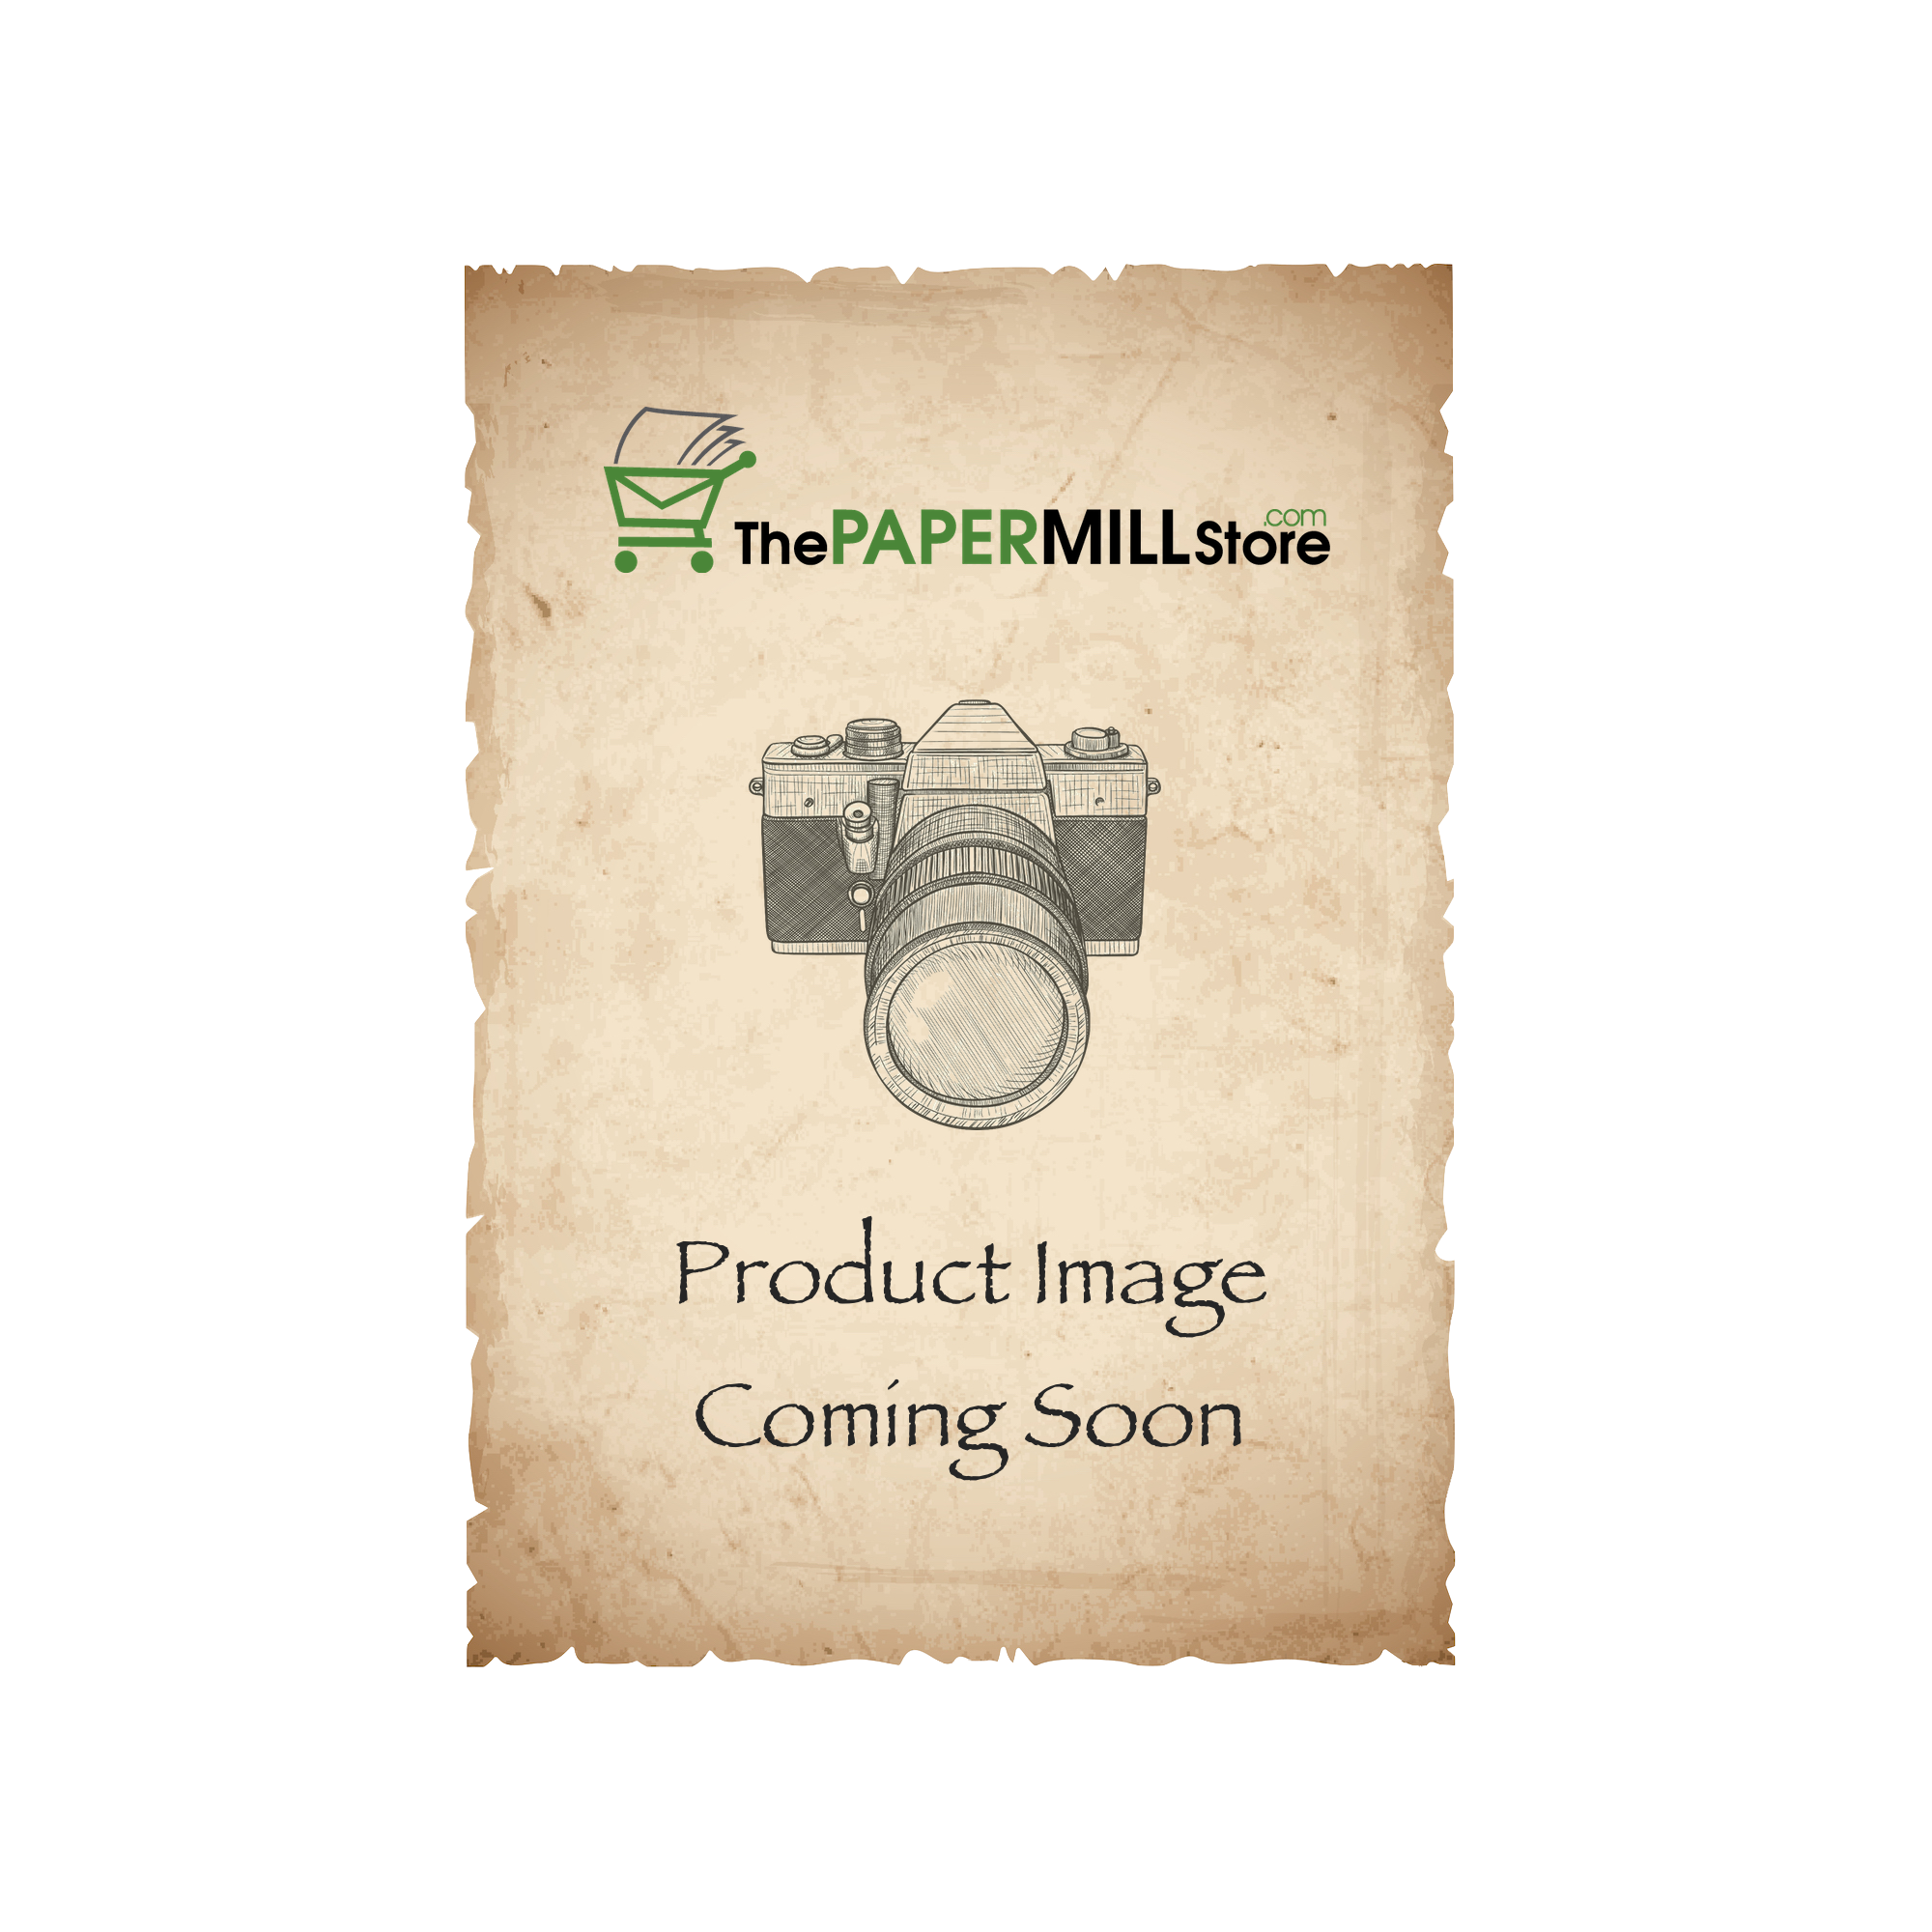 Strathmore Premium Enhance Ultimate White Envelopes - A7 (5 1/4 x 7 1/4) 70 lb Text Silk 250 per Box